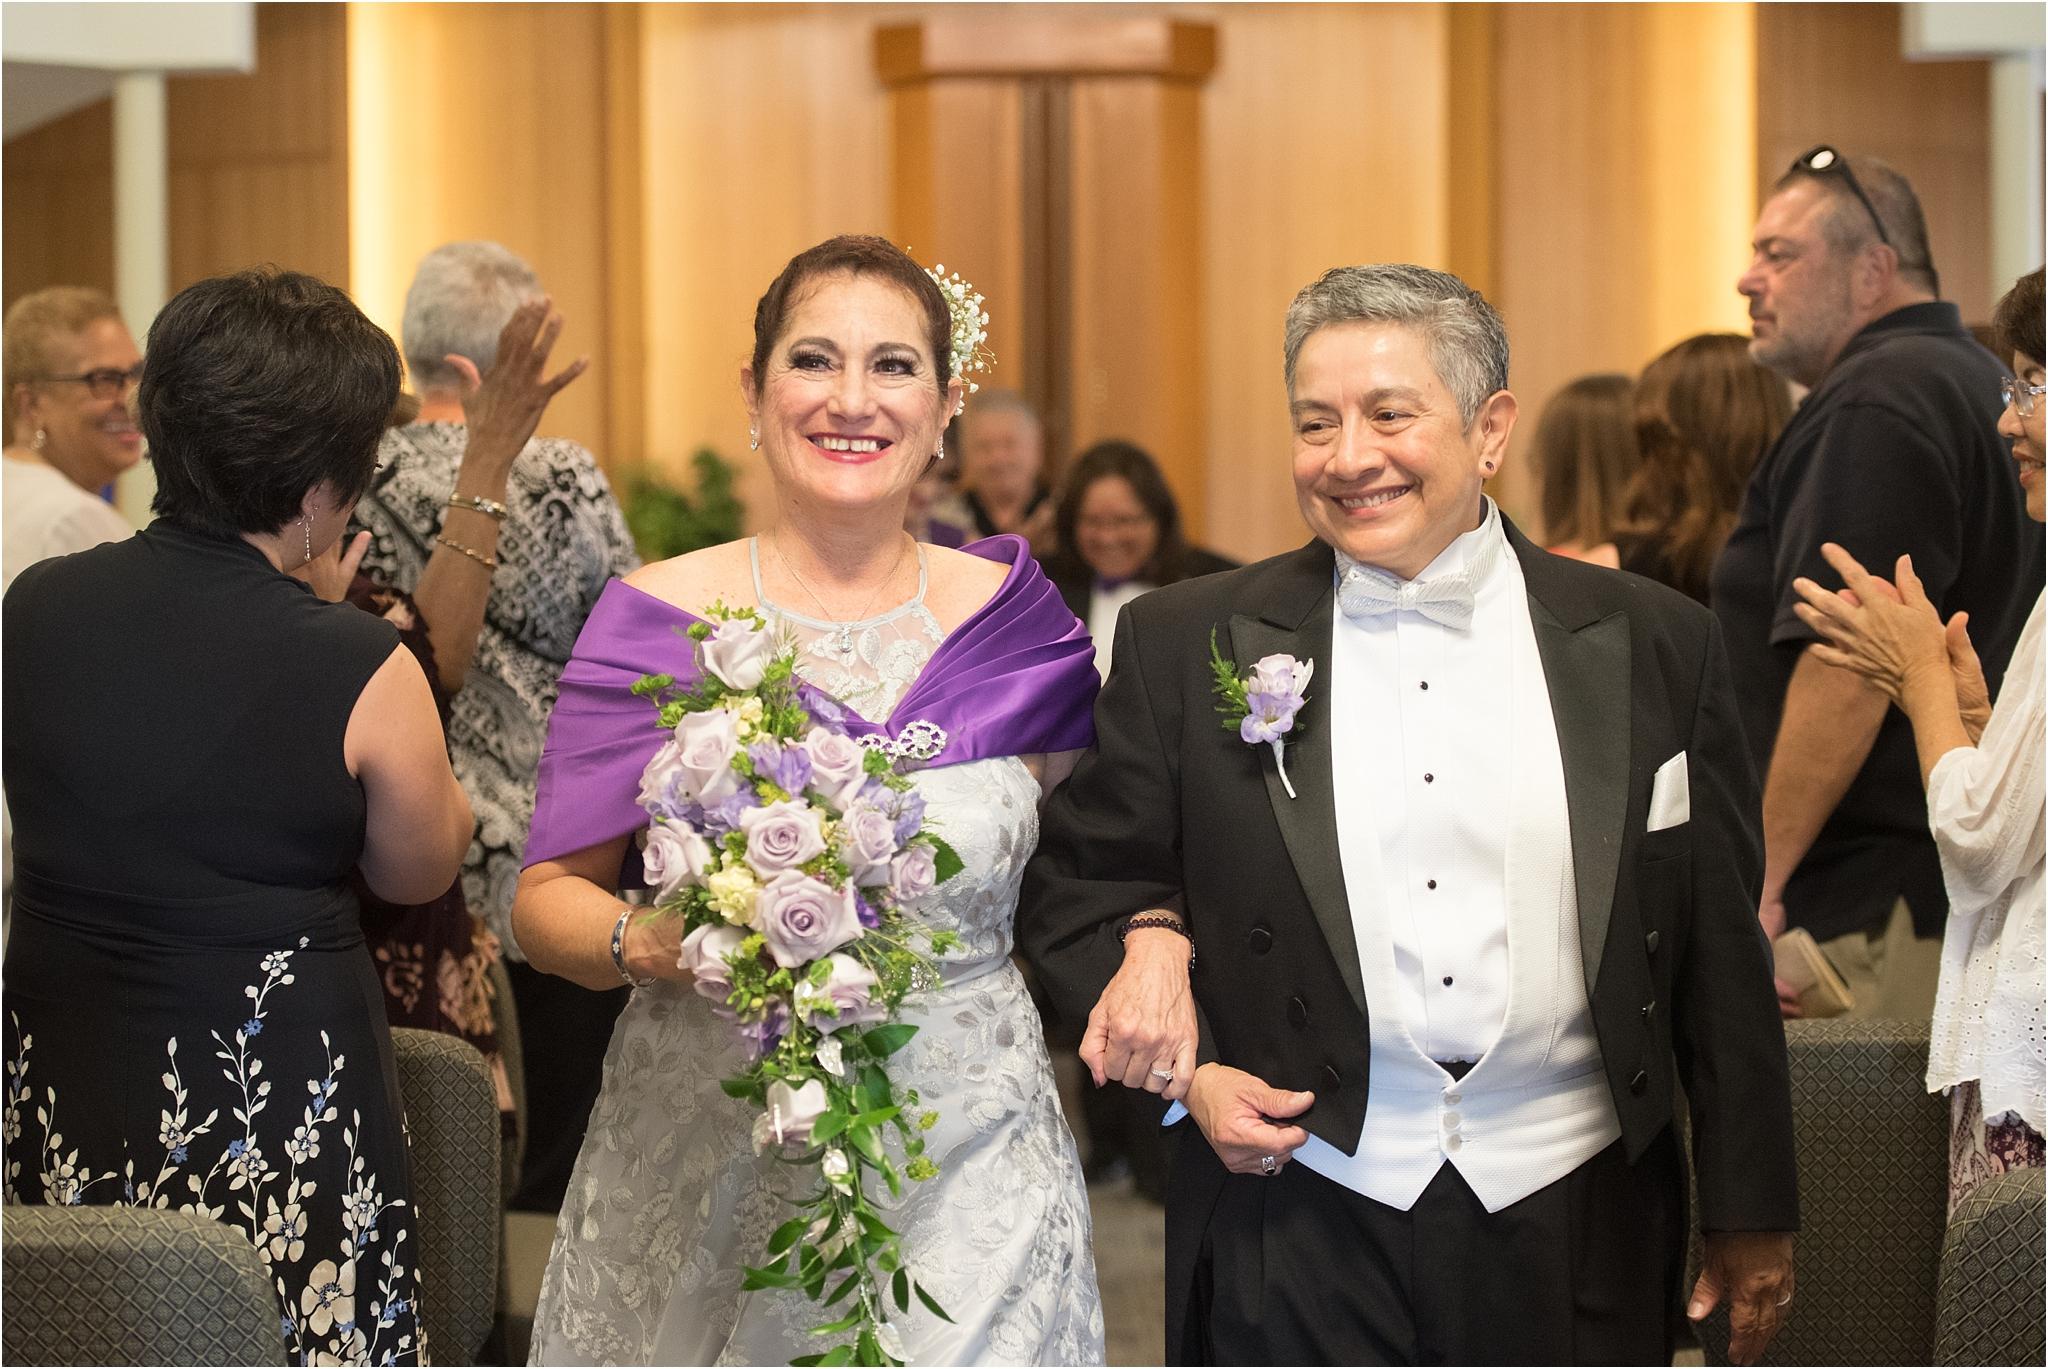 kayla kitts photography - albuquerque wedding photographer - hotel andaluz wedding_0013.jpg